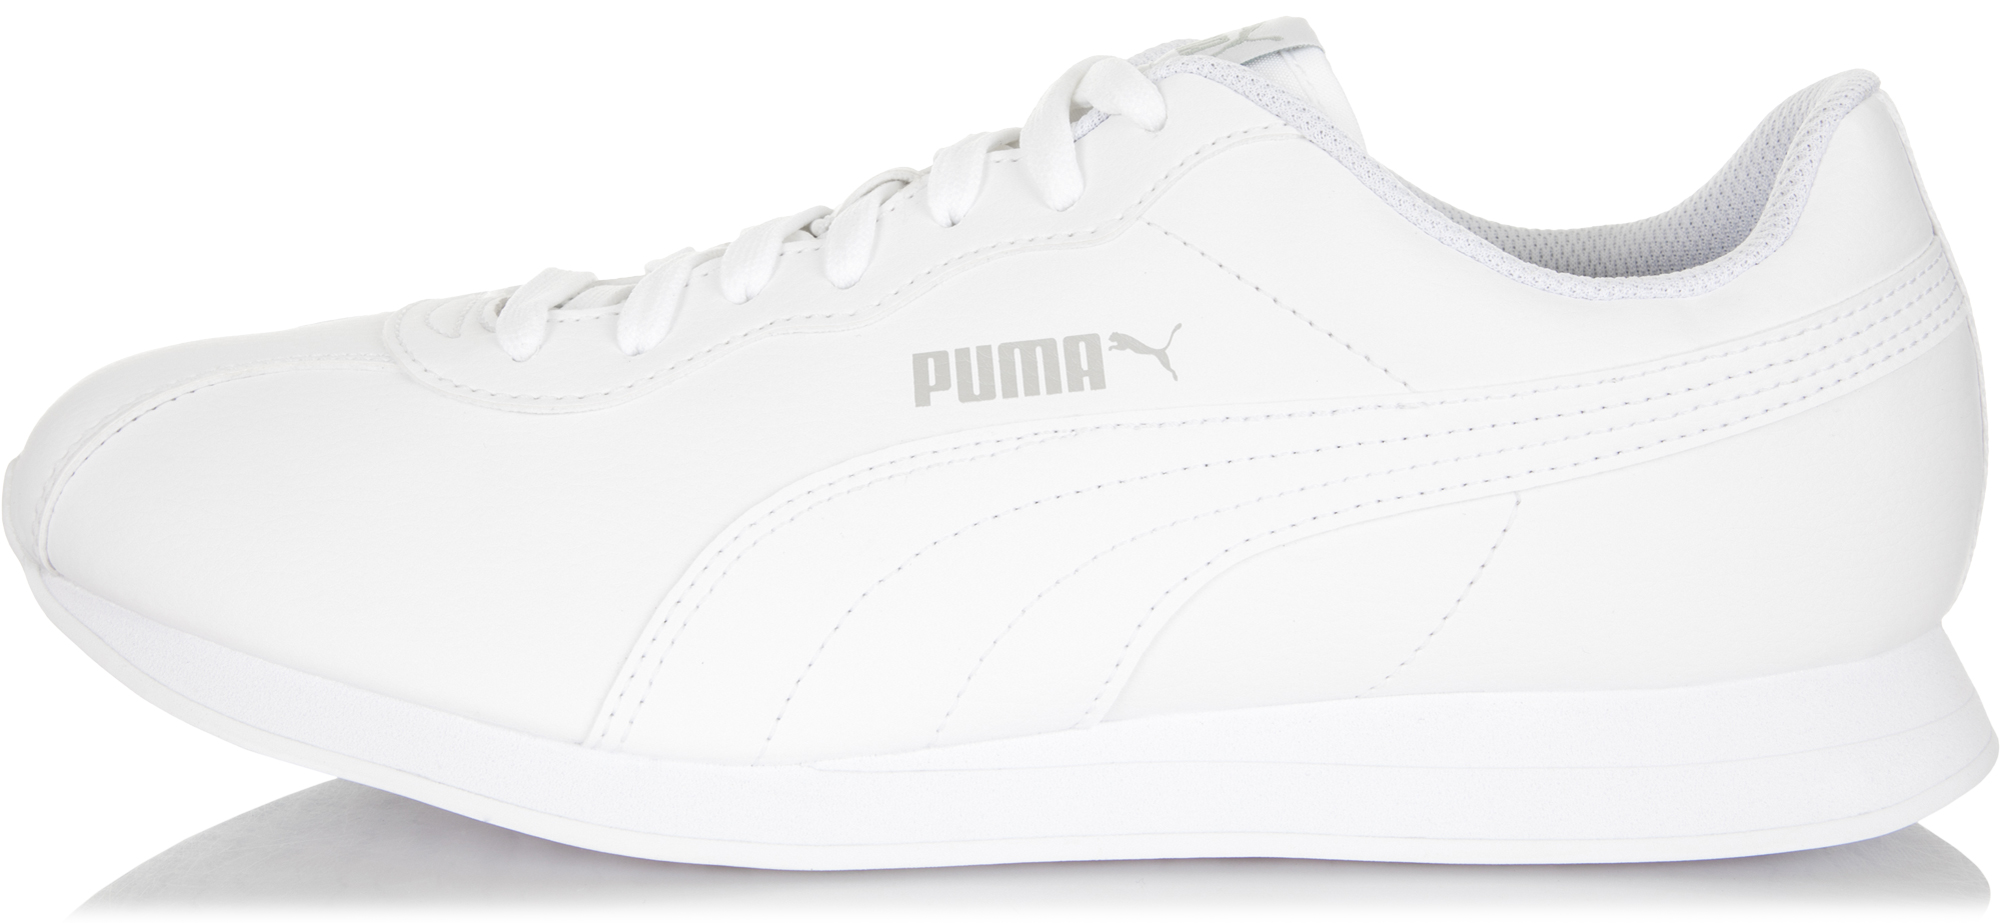 Puma Кроссовки женские Puma Turin II, размер 37 цена